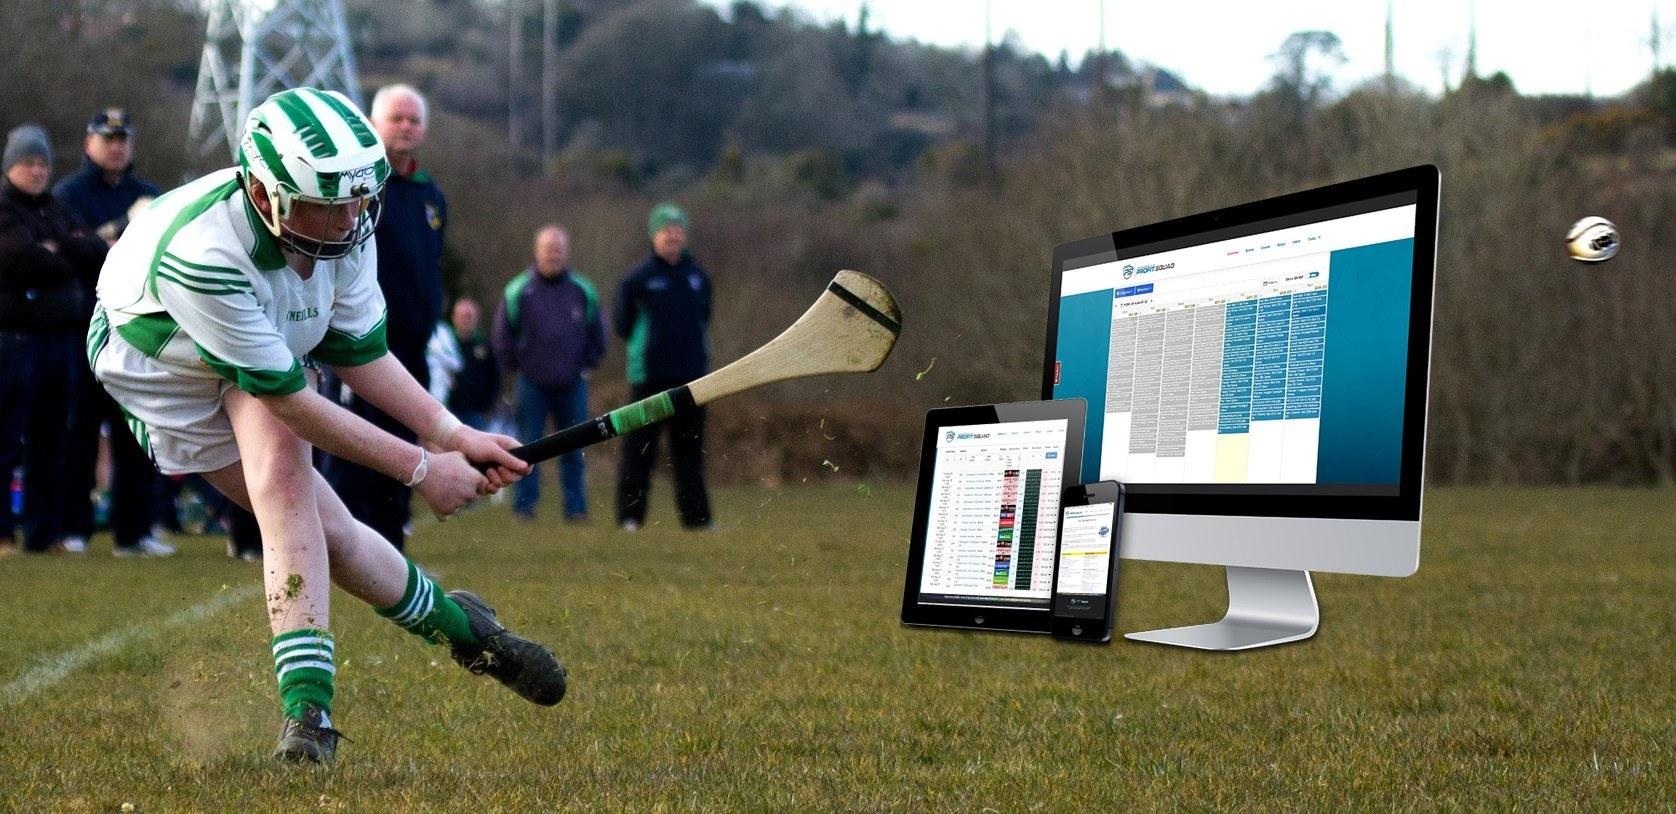 Hurling-Spieler, PC, Tablet